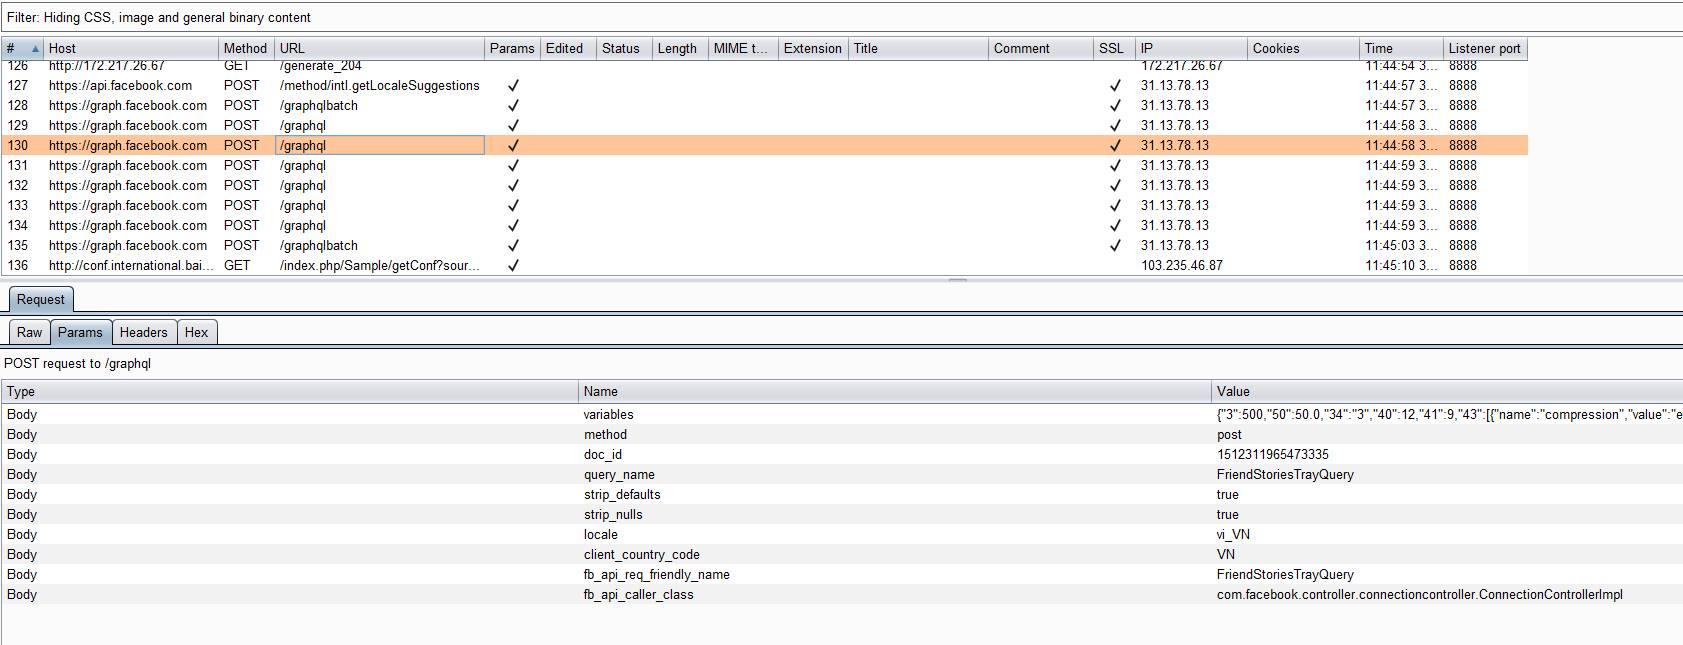 GitHub - knoobdev/Bypass-Facebook-Messenger-SSL-Pinning: Bypassing